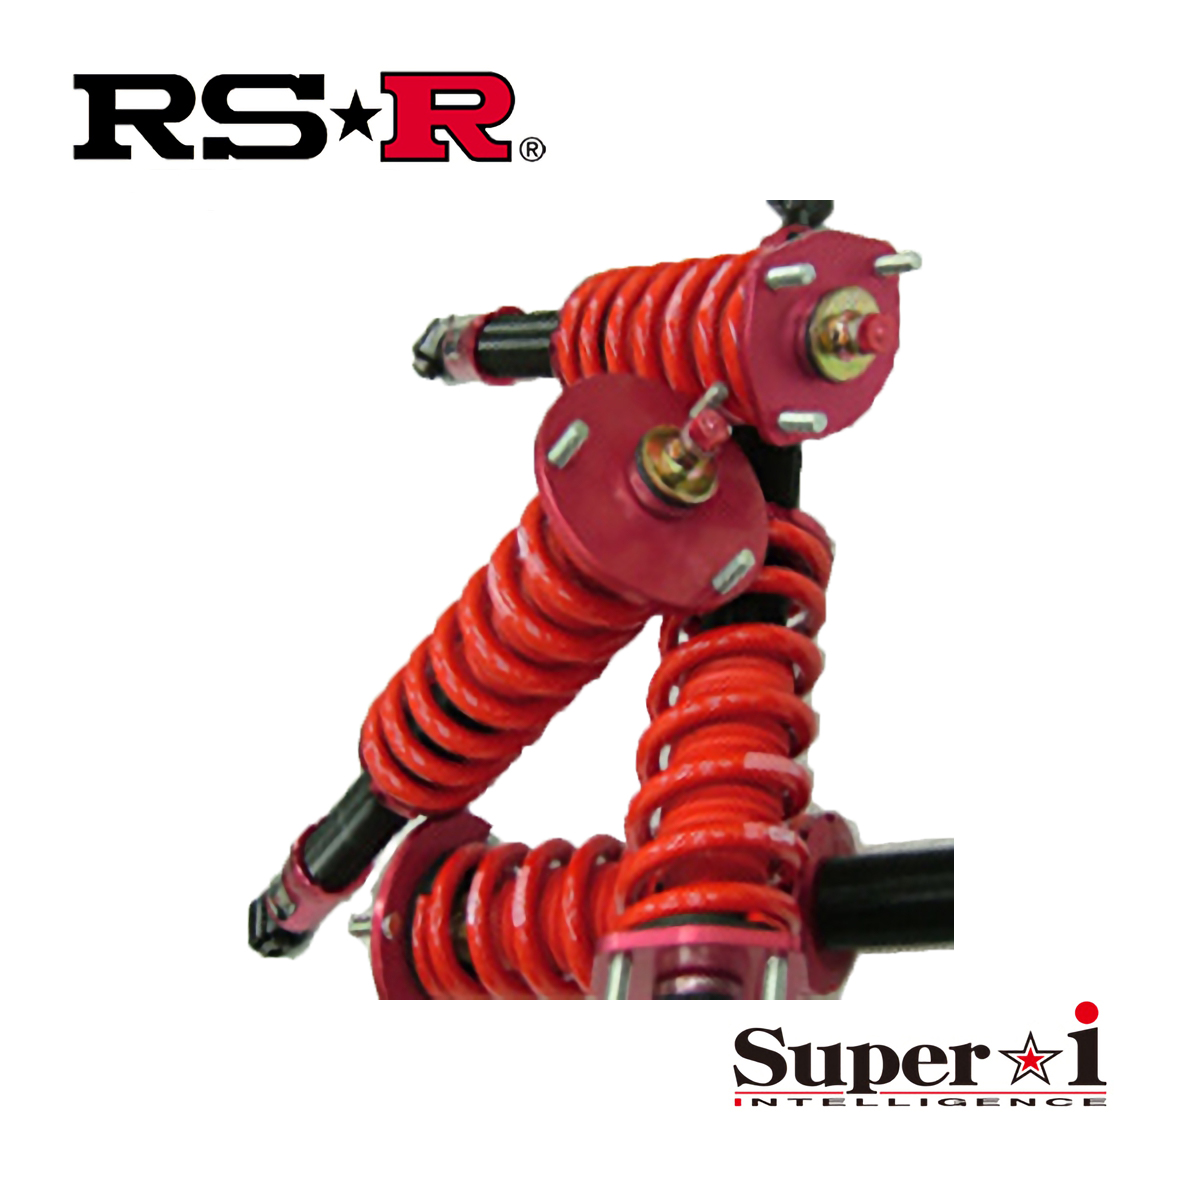 RS-R IS200t Fスポーツ ASE30 車高調 リア車高調整 ネジ式 SIT193M RSR スーパーi RSR 個人宅発送追金有